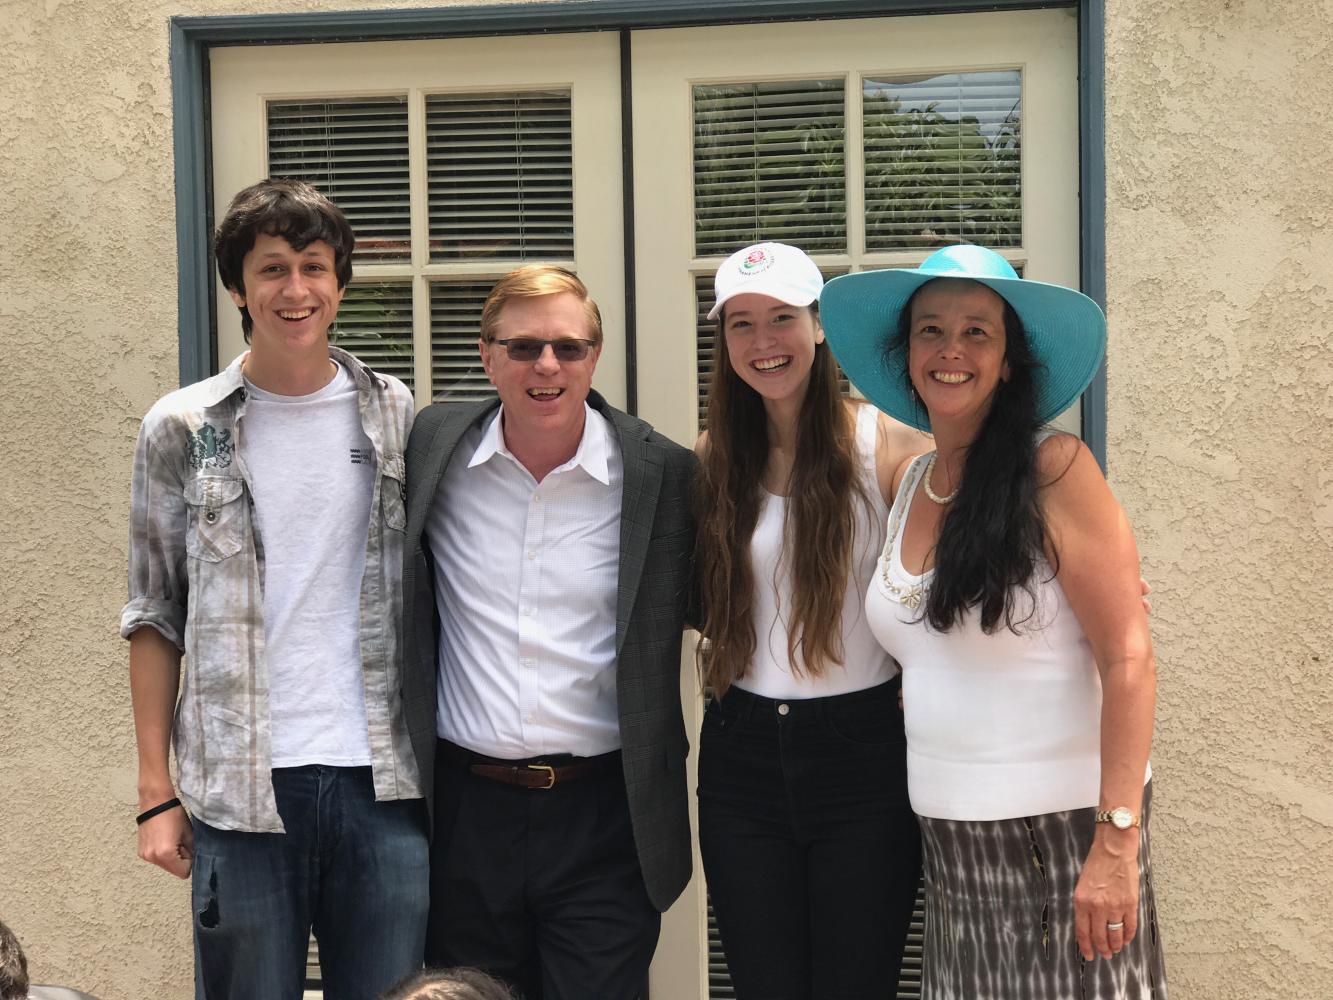 Dr. Yoshimura's family: Liam (17), Bill, Vivian (15) and Dr. Yoshimura